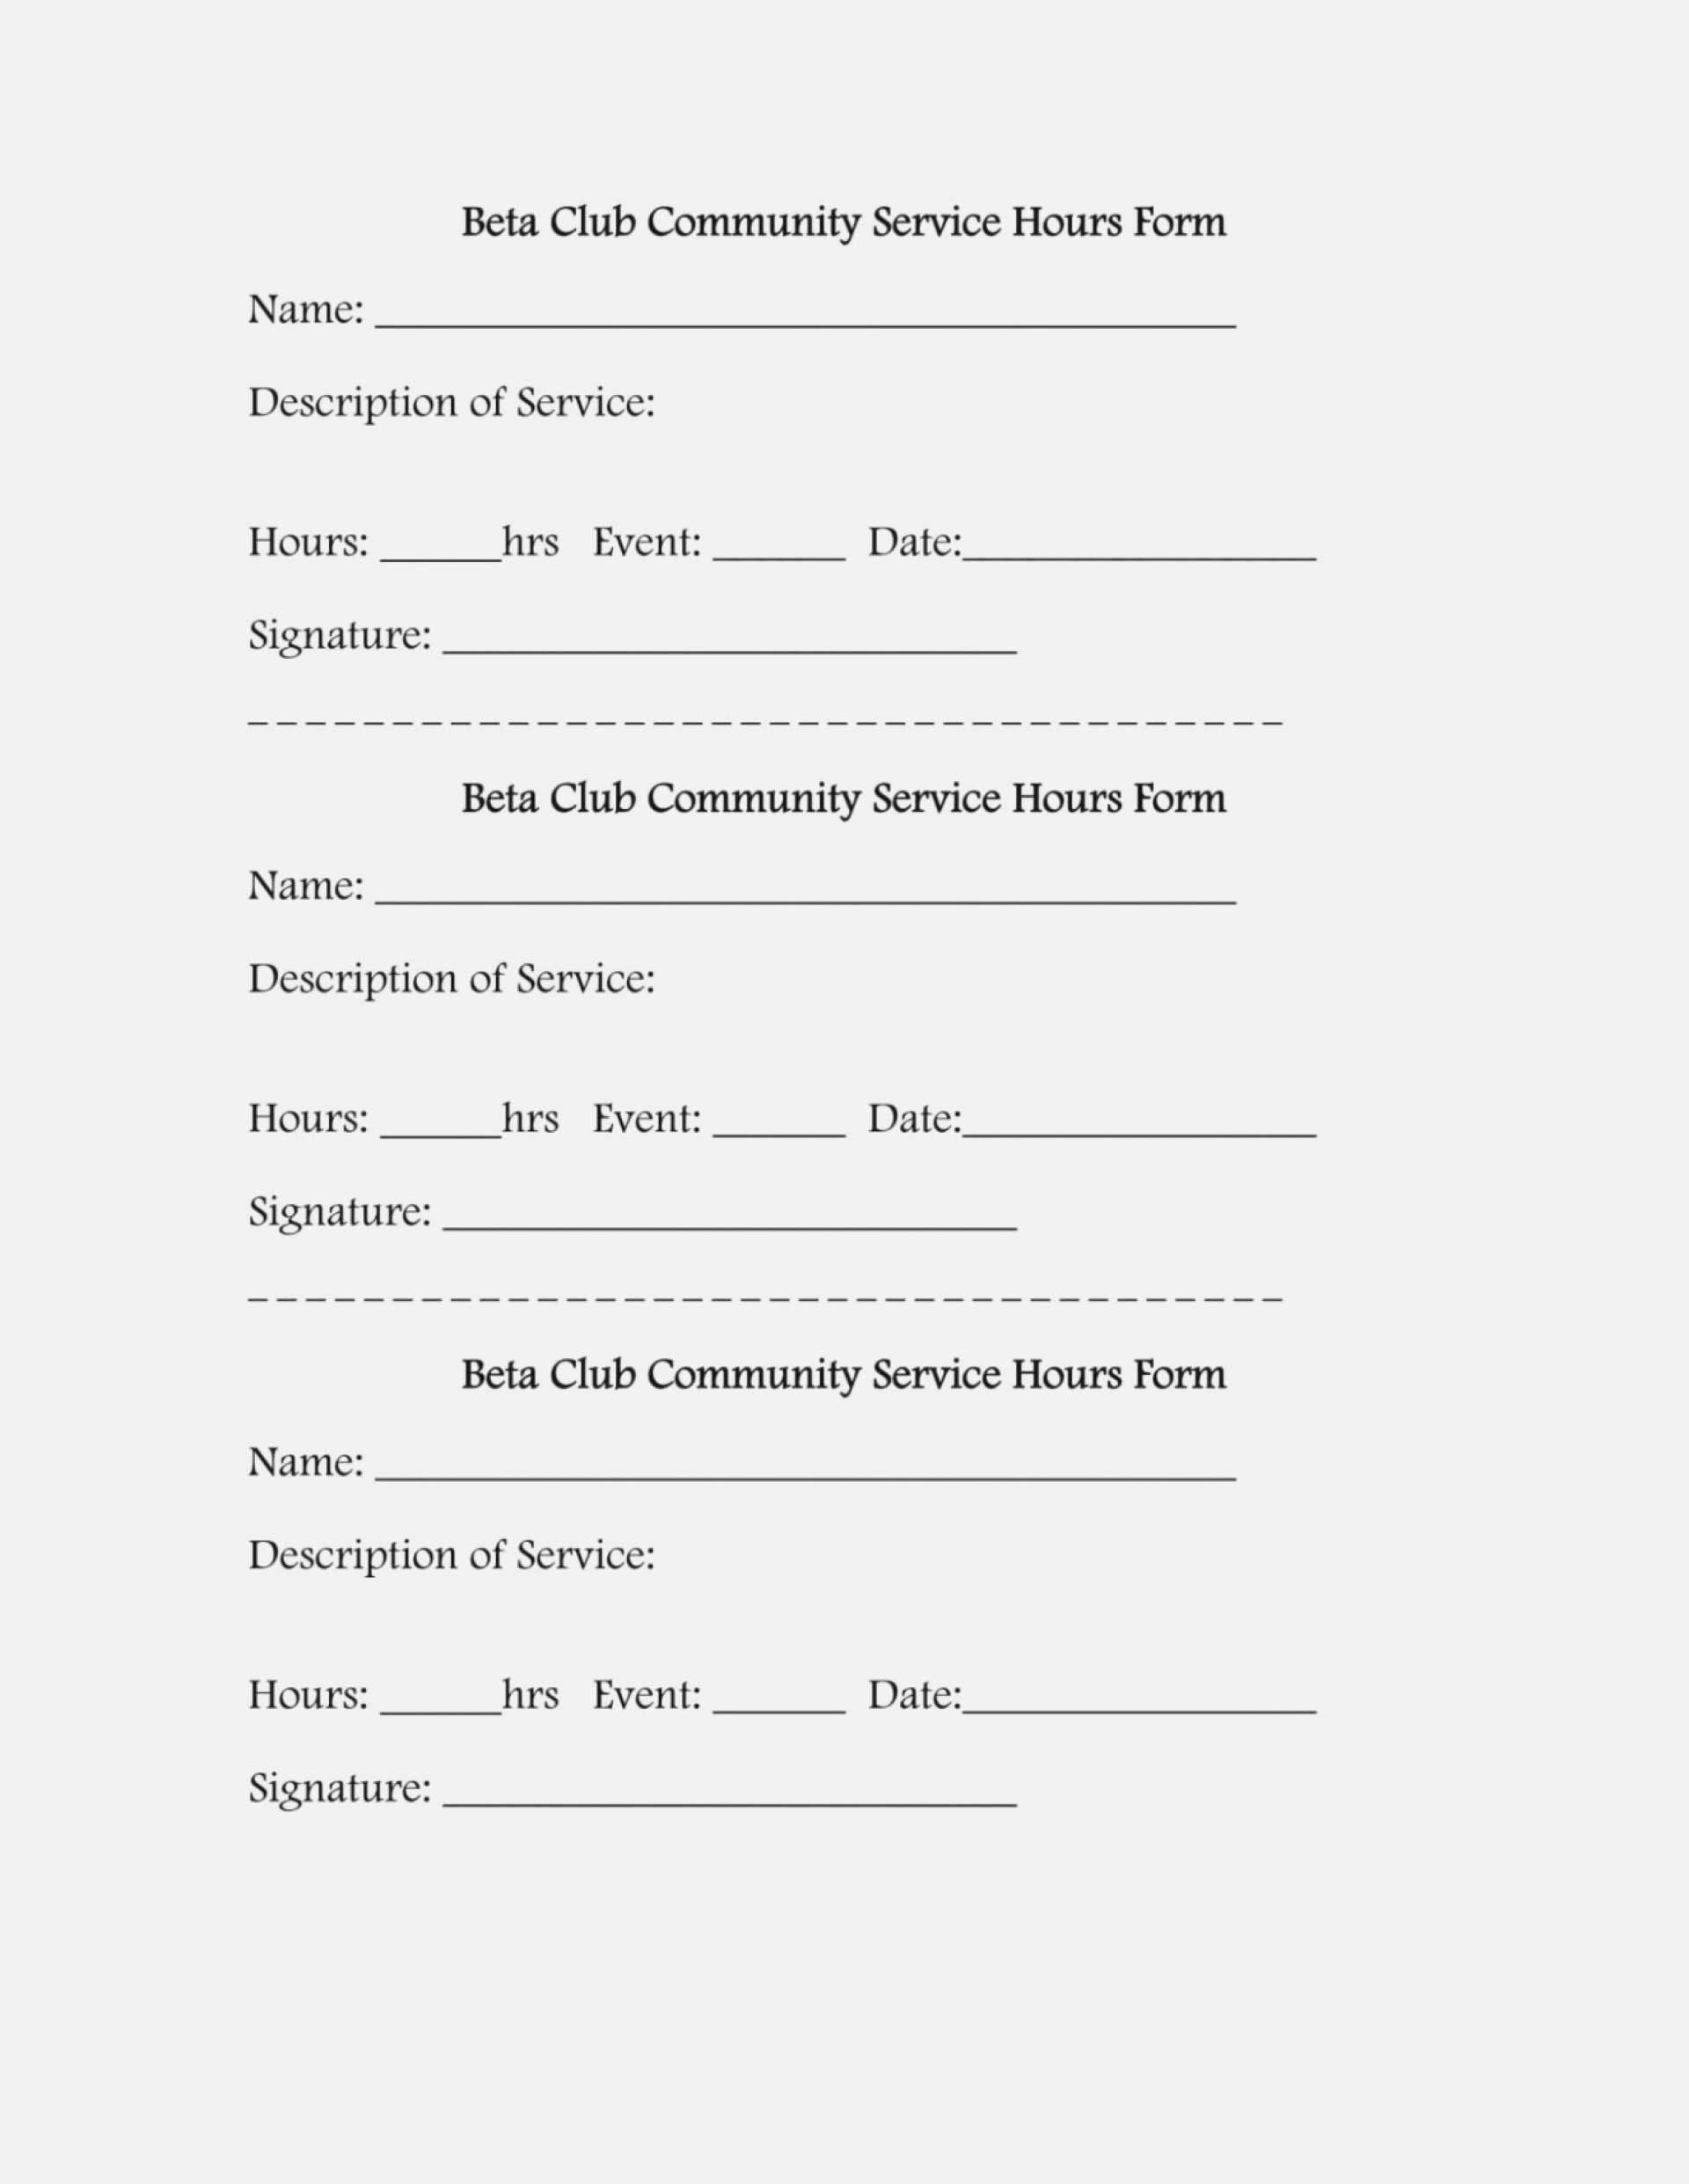 024 Volunteer Hours Form Template Application Unbelievable Regarding Community Service Template Word